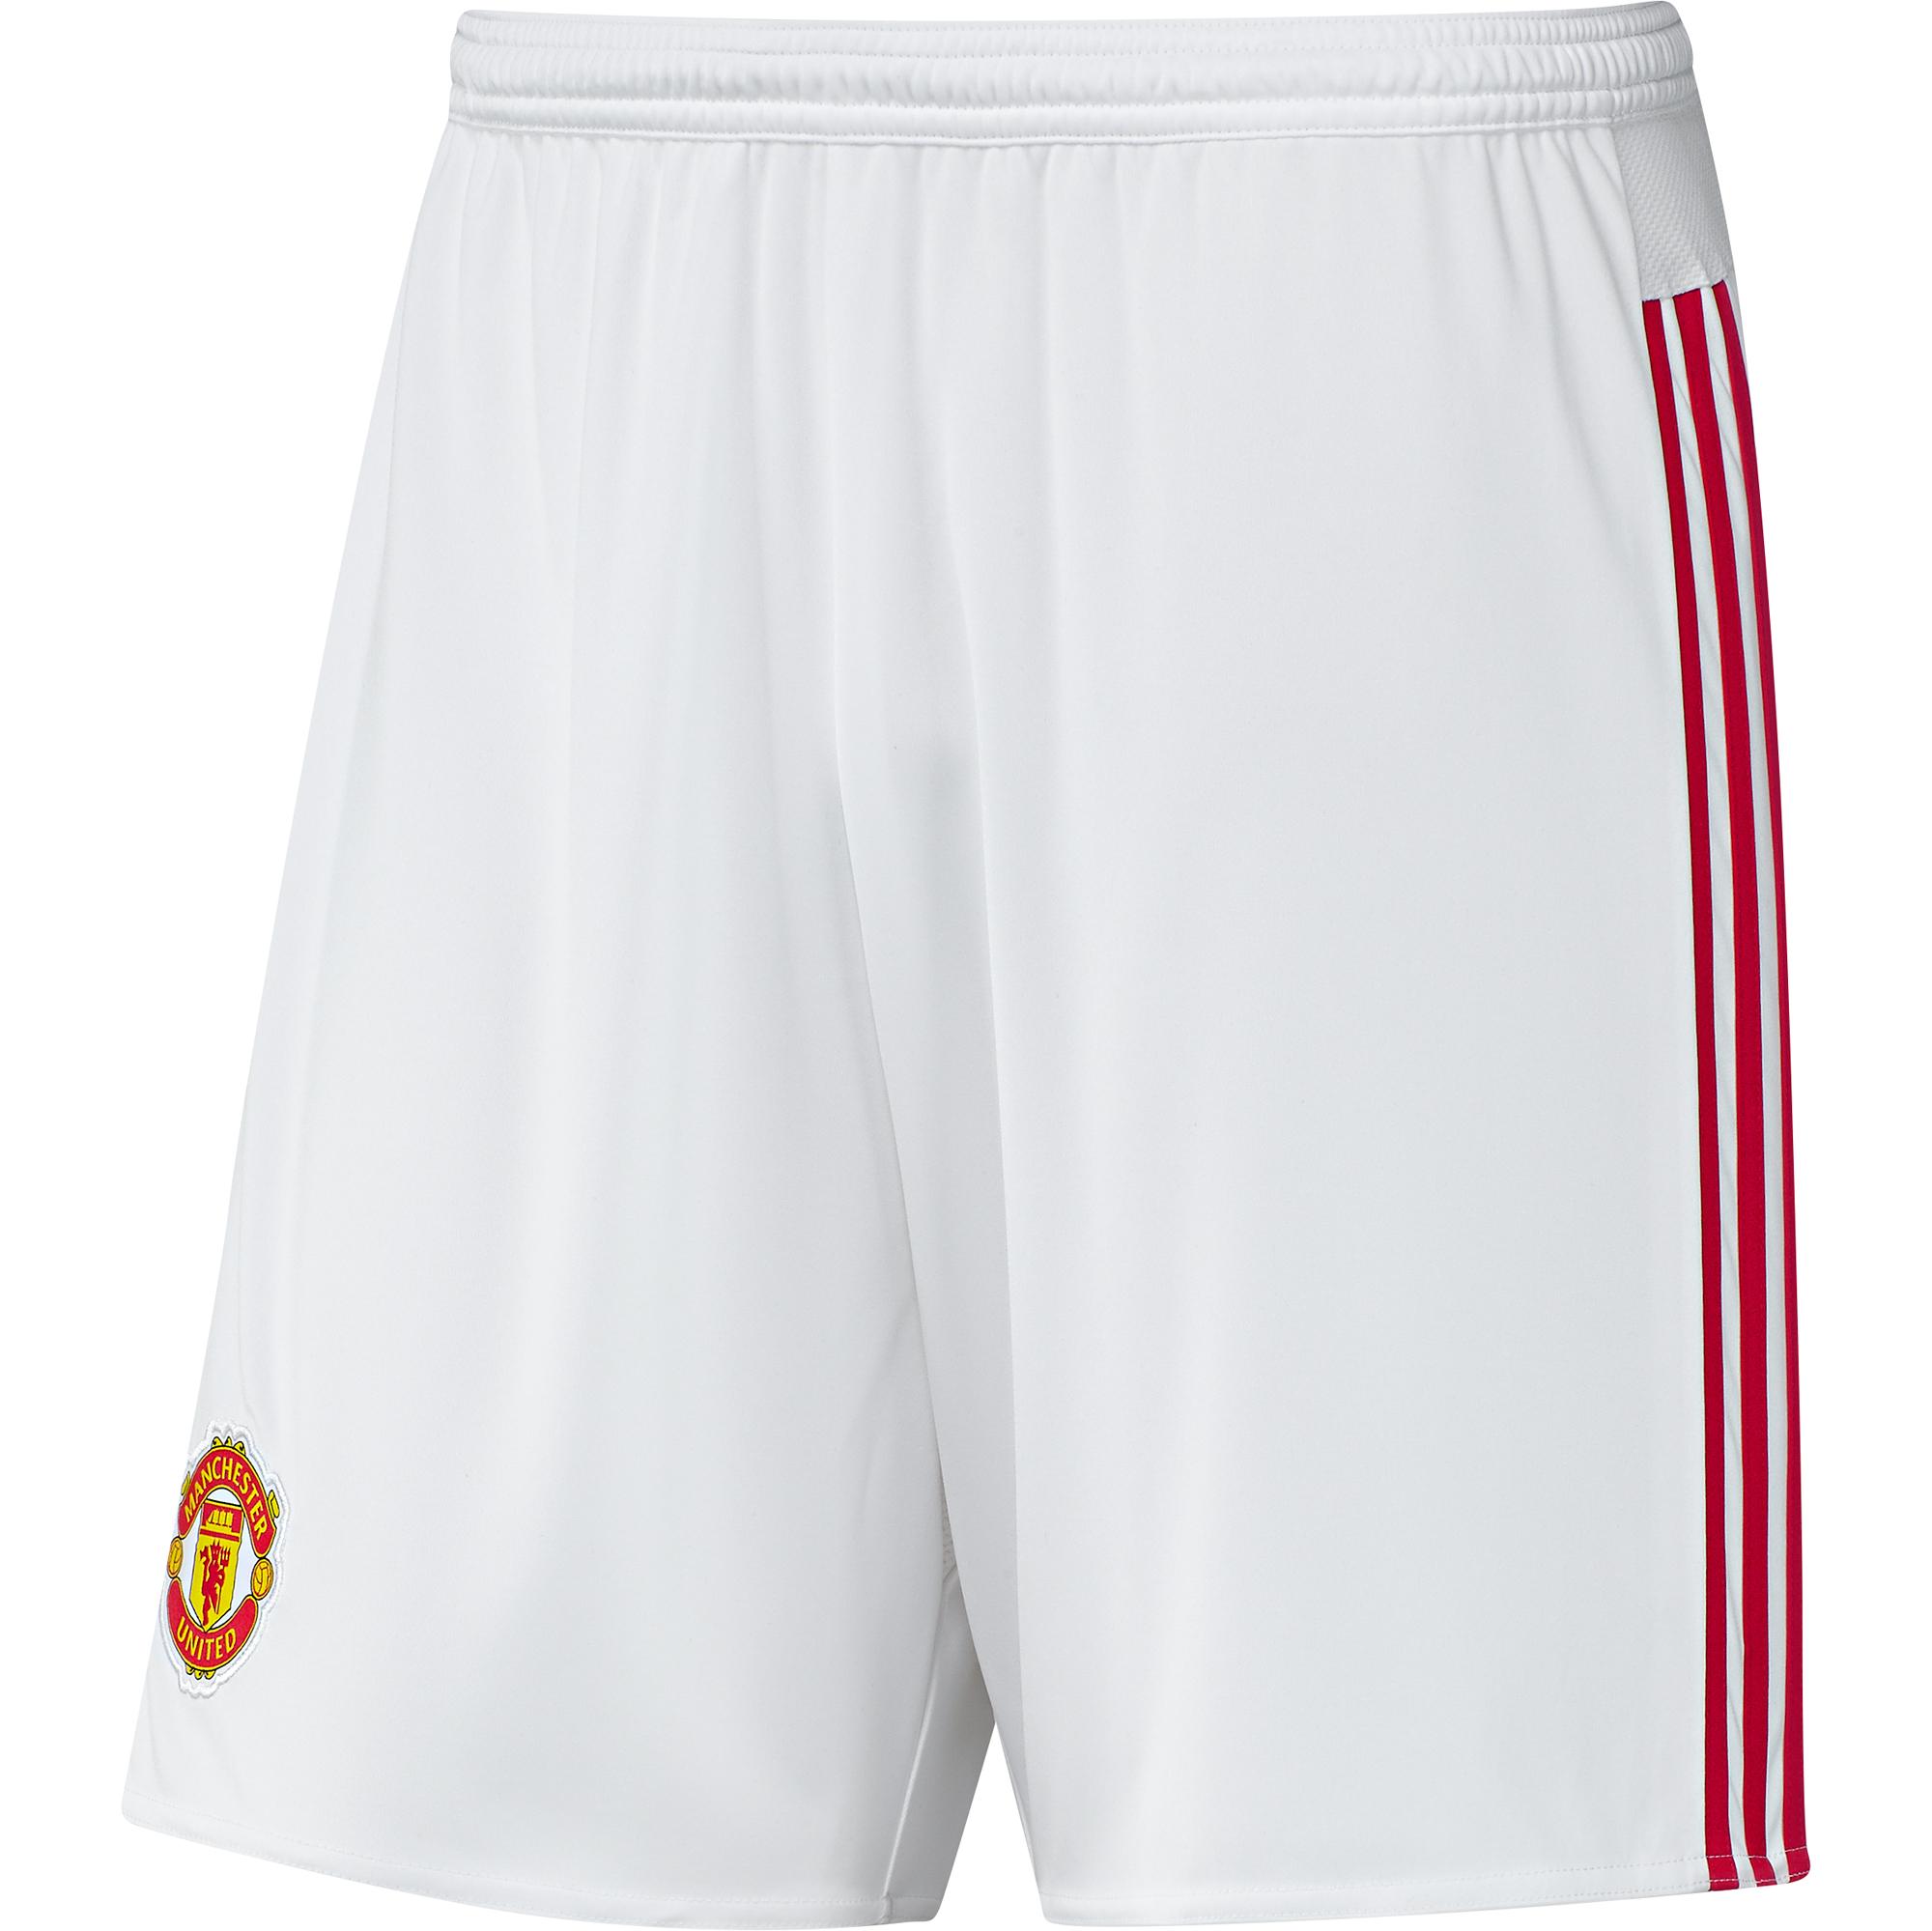 adidas Herren Manchester United Home Short 2015/16 AC1420 XXL